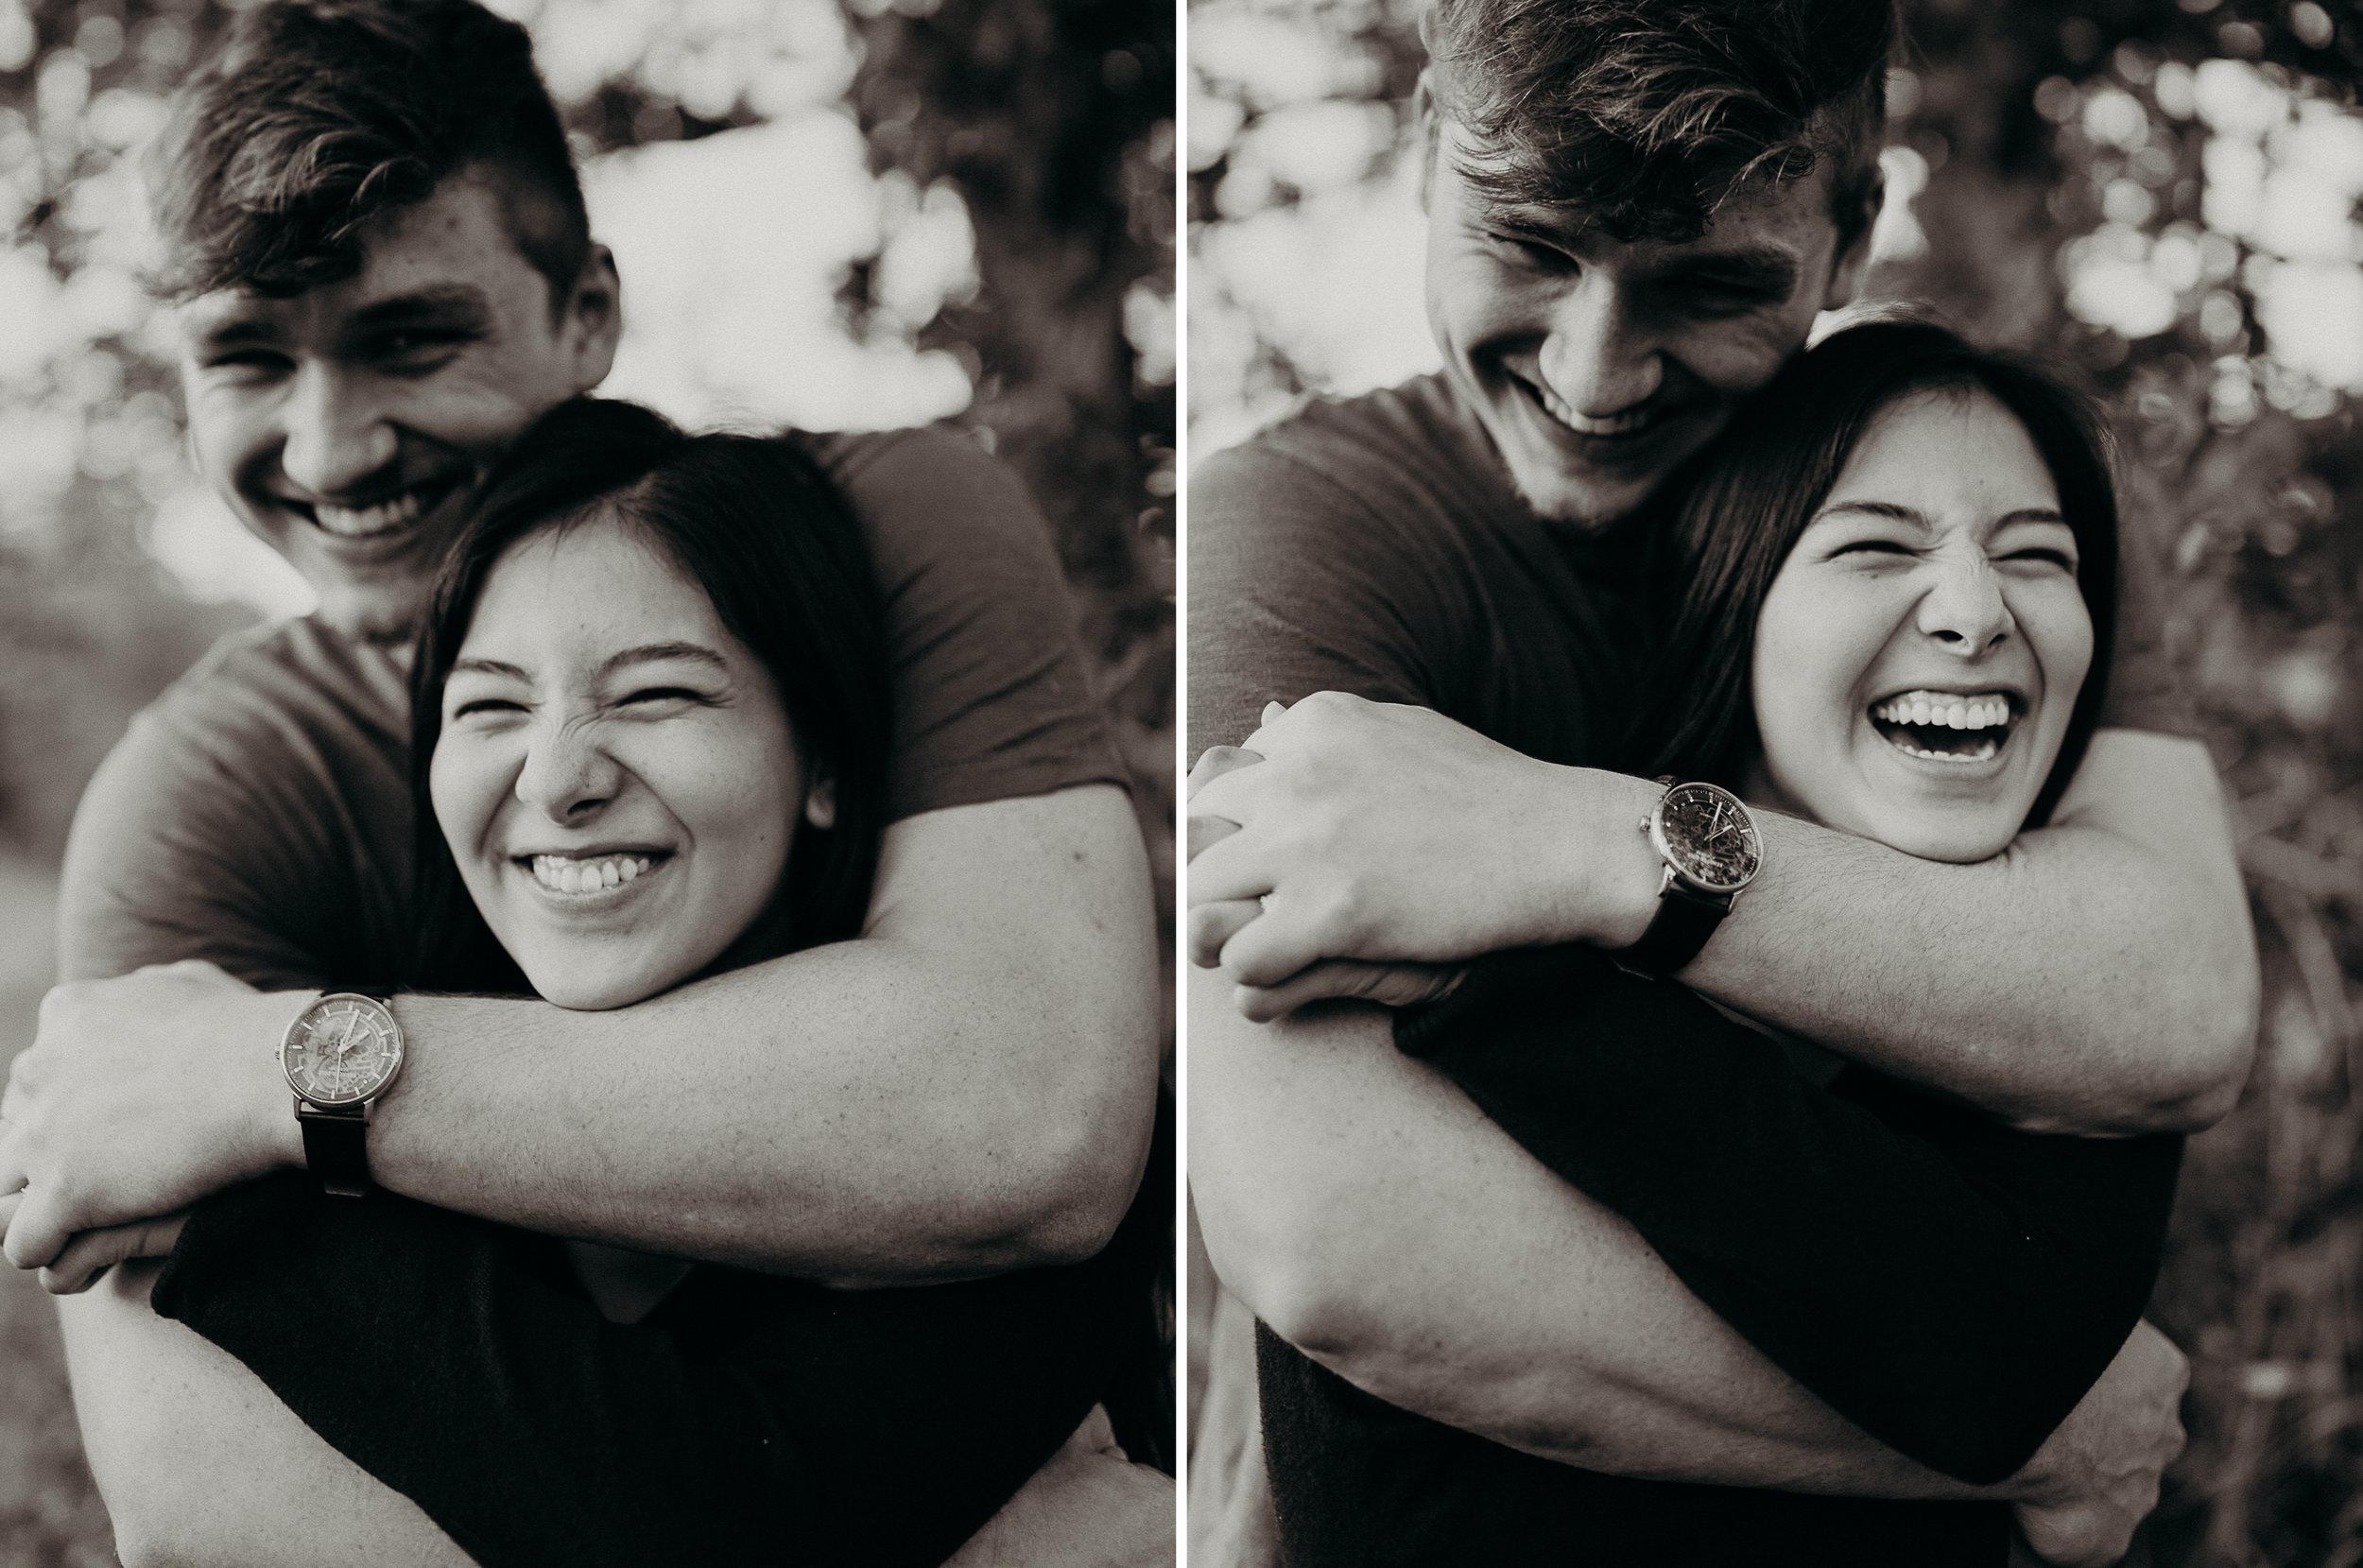 caleb holding his girl.jpg